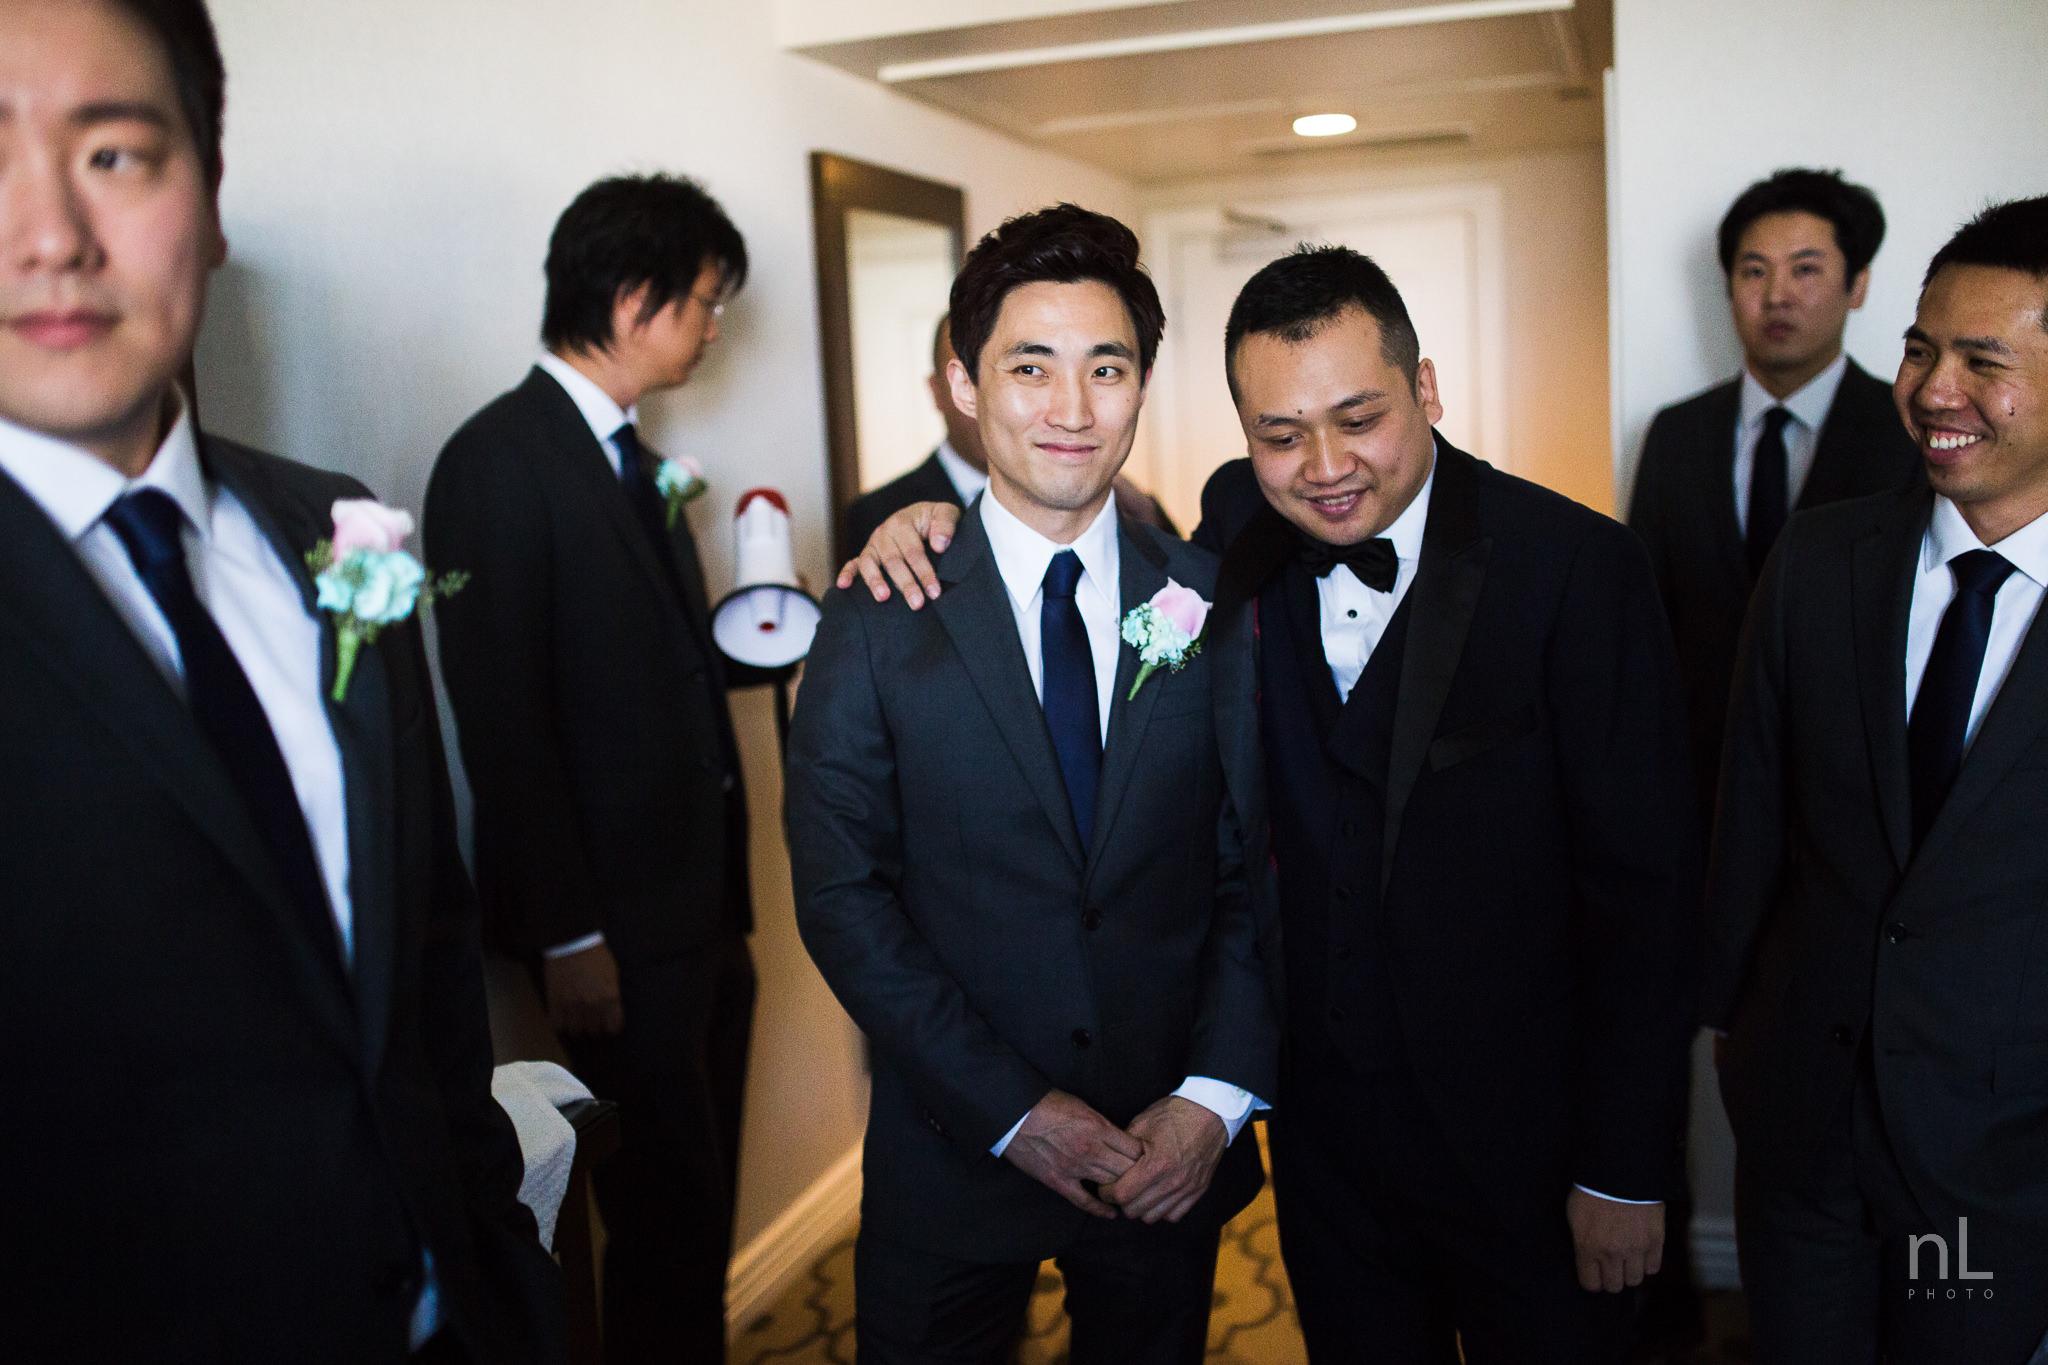 nick-lie-photography-los-angeles-wedding-photographer-3.jpg